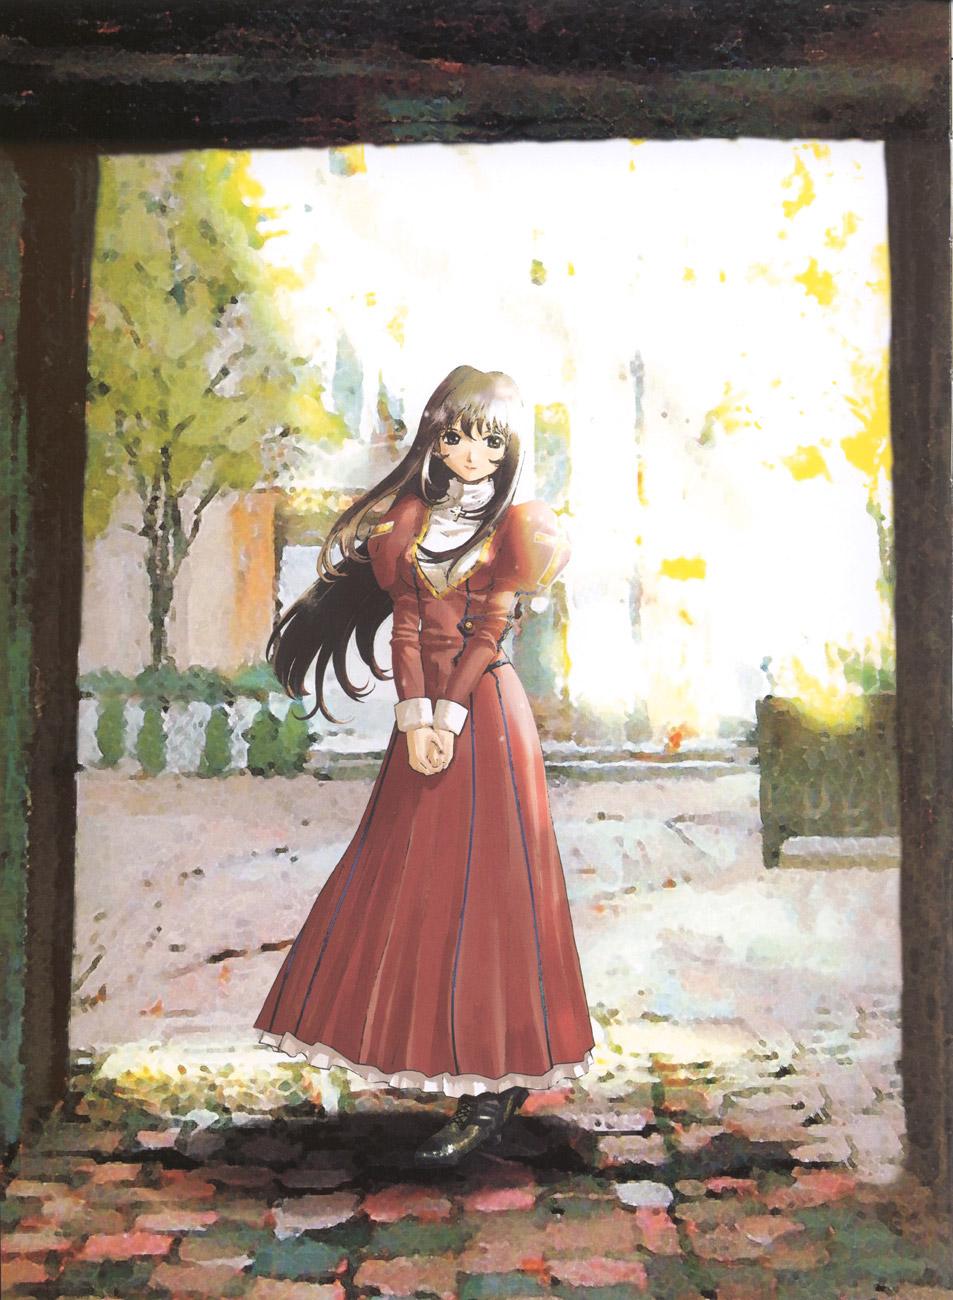 Sakura Wars illustrations: the Origin + Tribute image by Rikudo Koshi